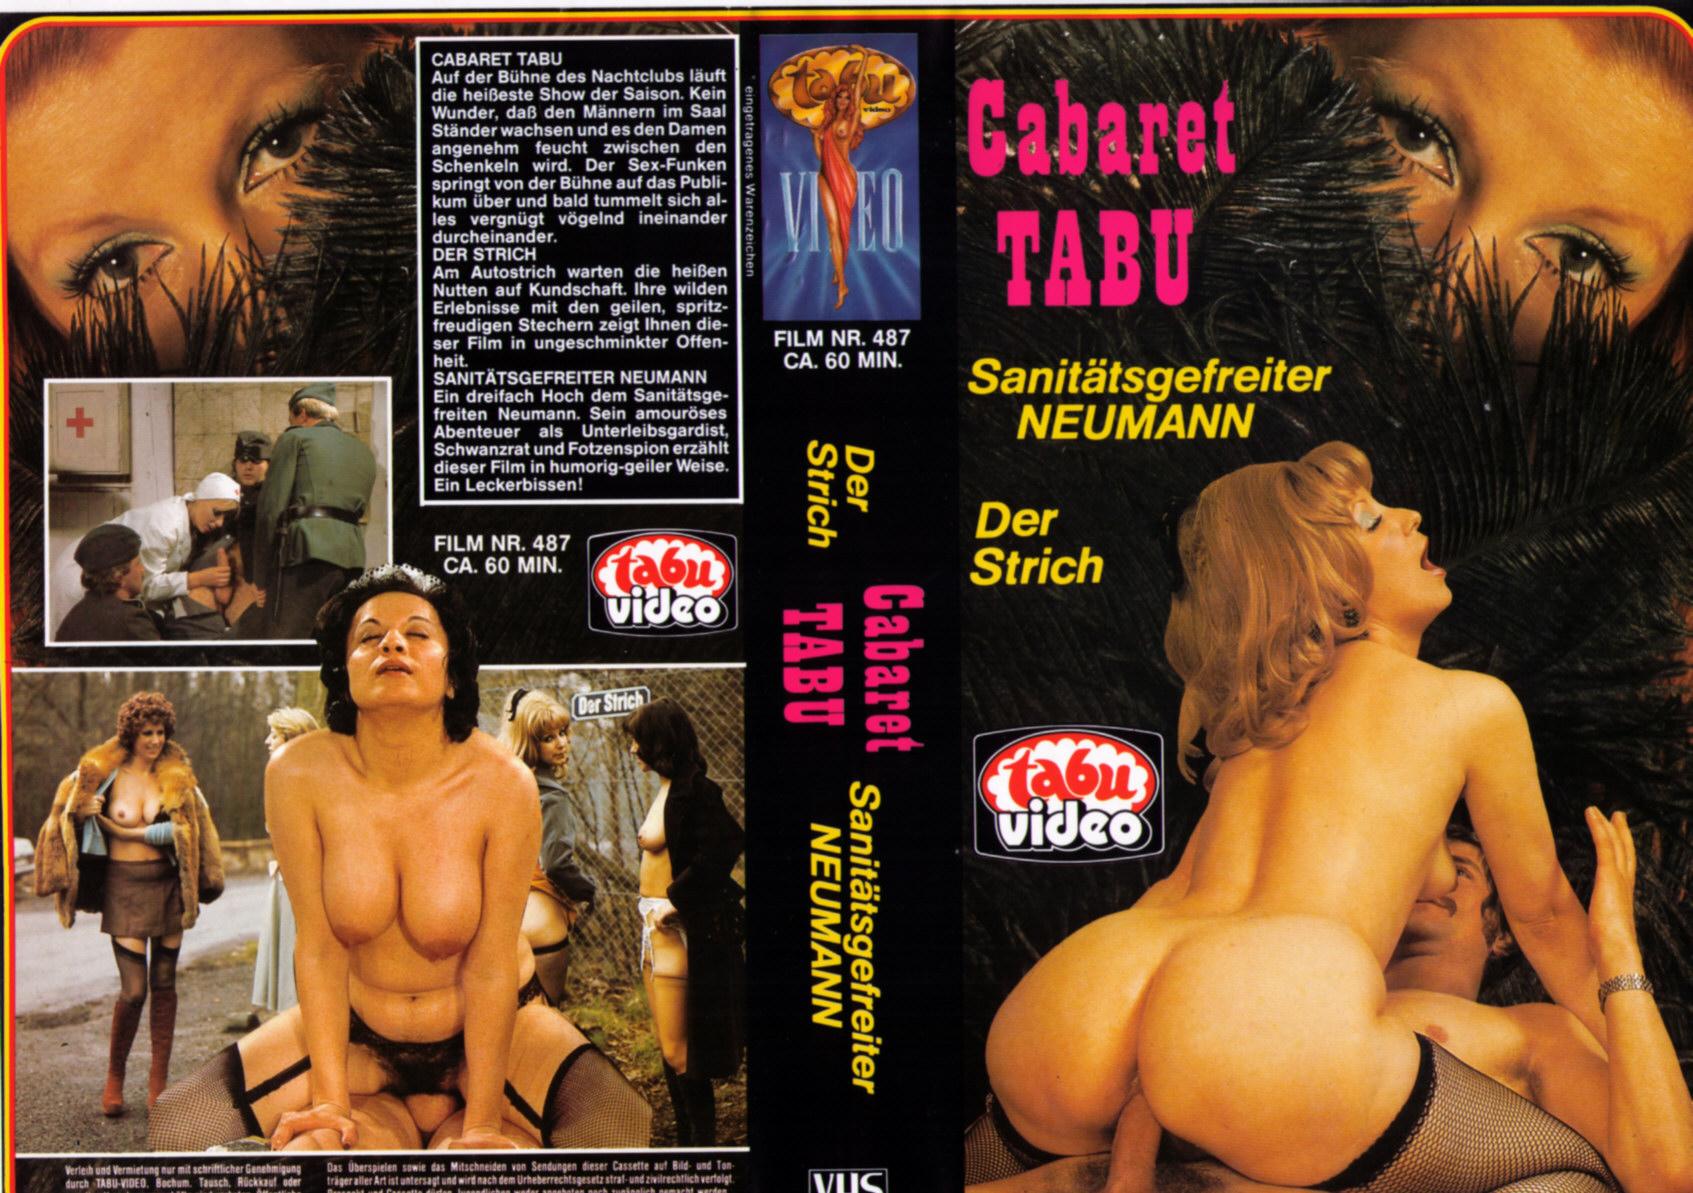 61738_CabaretTabu_123_505lo